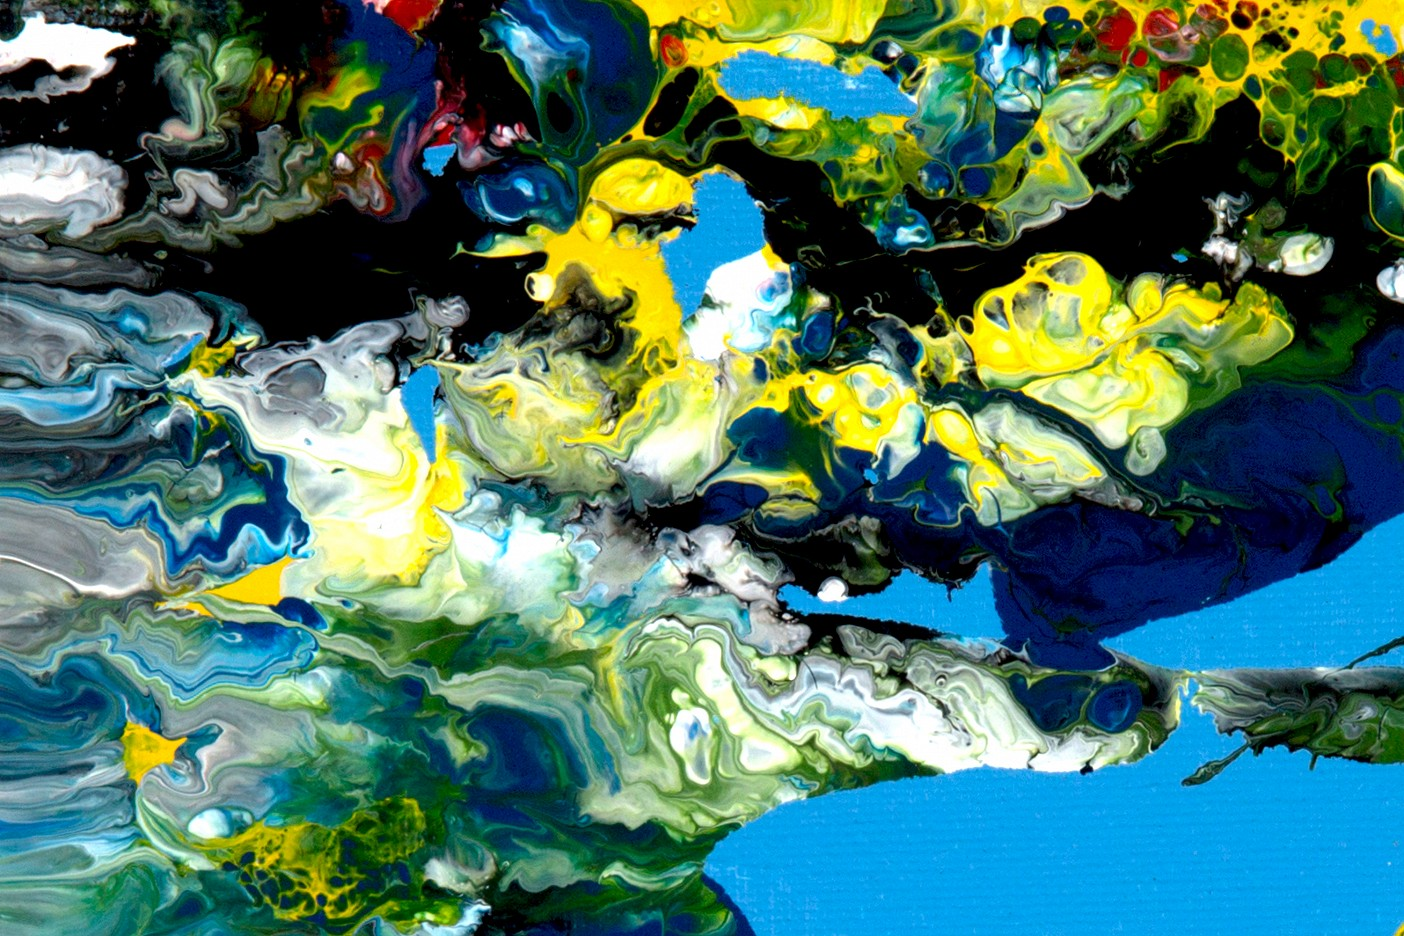 Korallenriff, RWV 351-07